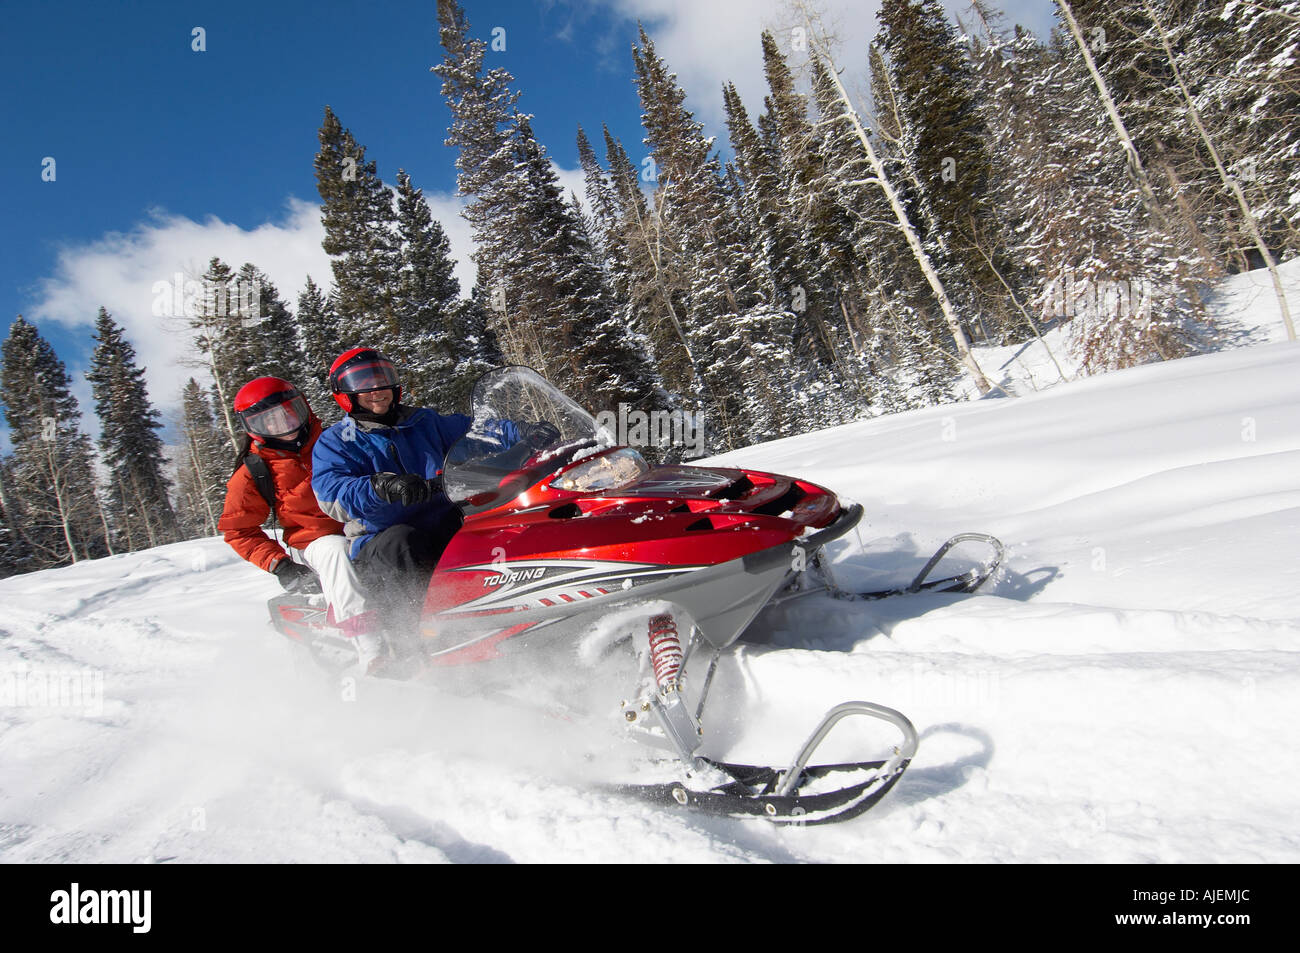 Couple driving snowmobile through snow - Stock Image